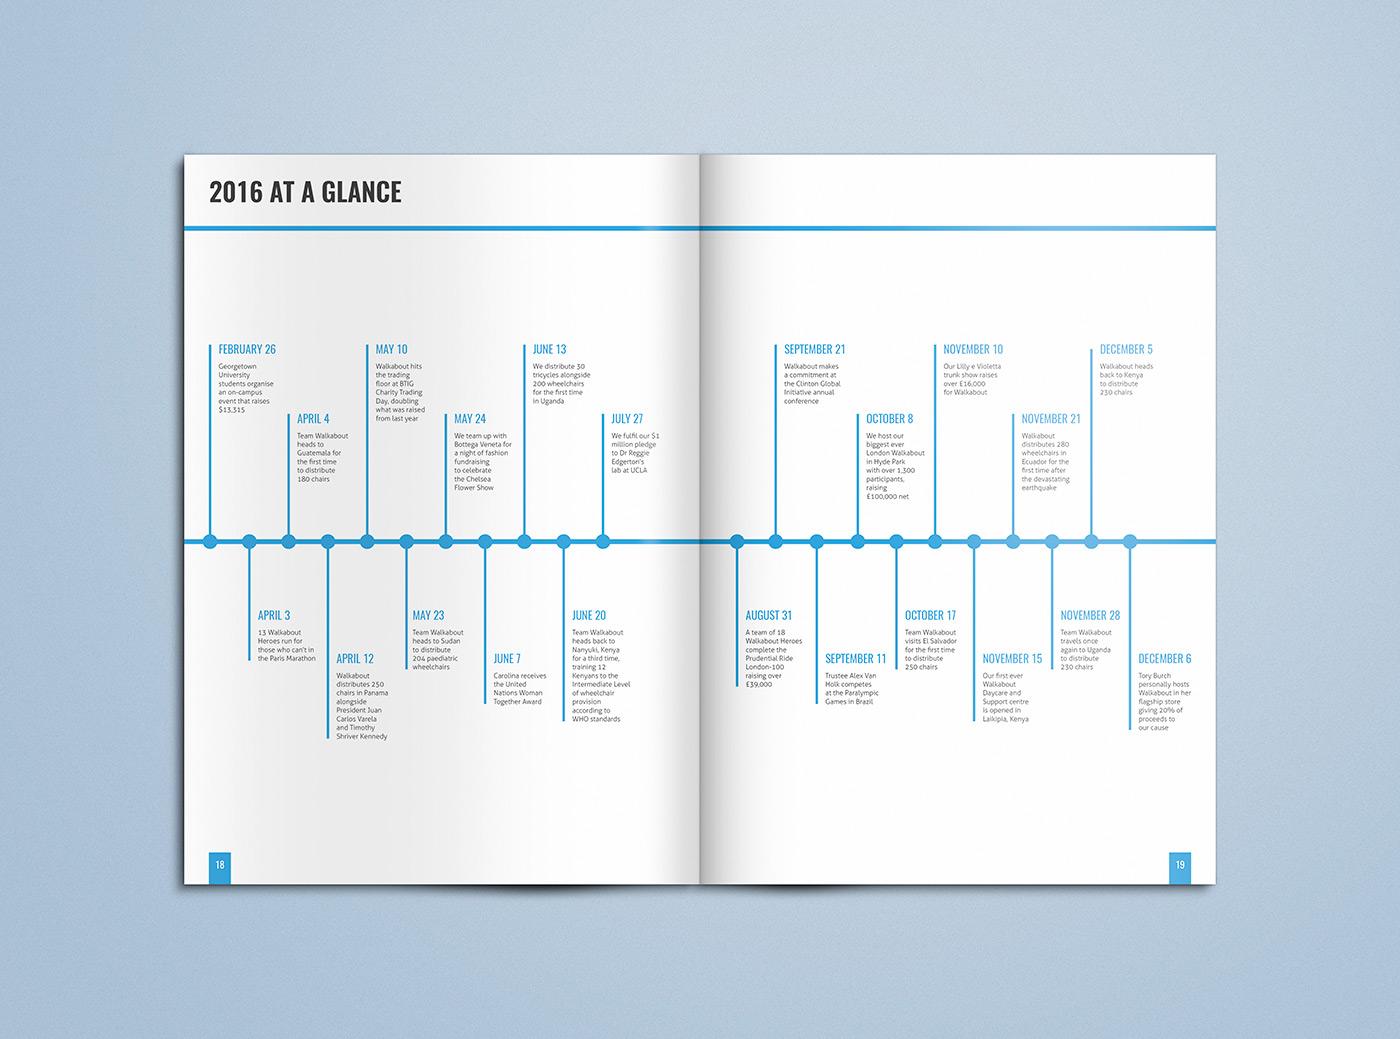 Walkabout-Foundation_2017-Annual-Report-Concept_02_Rob-Barrett